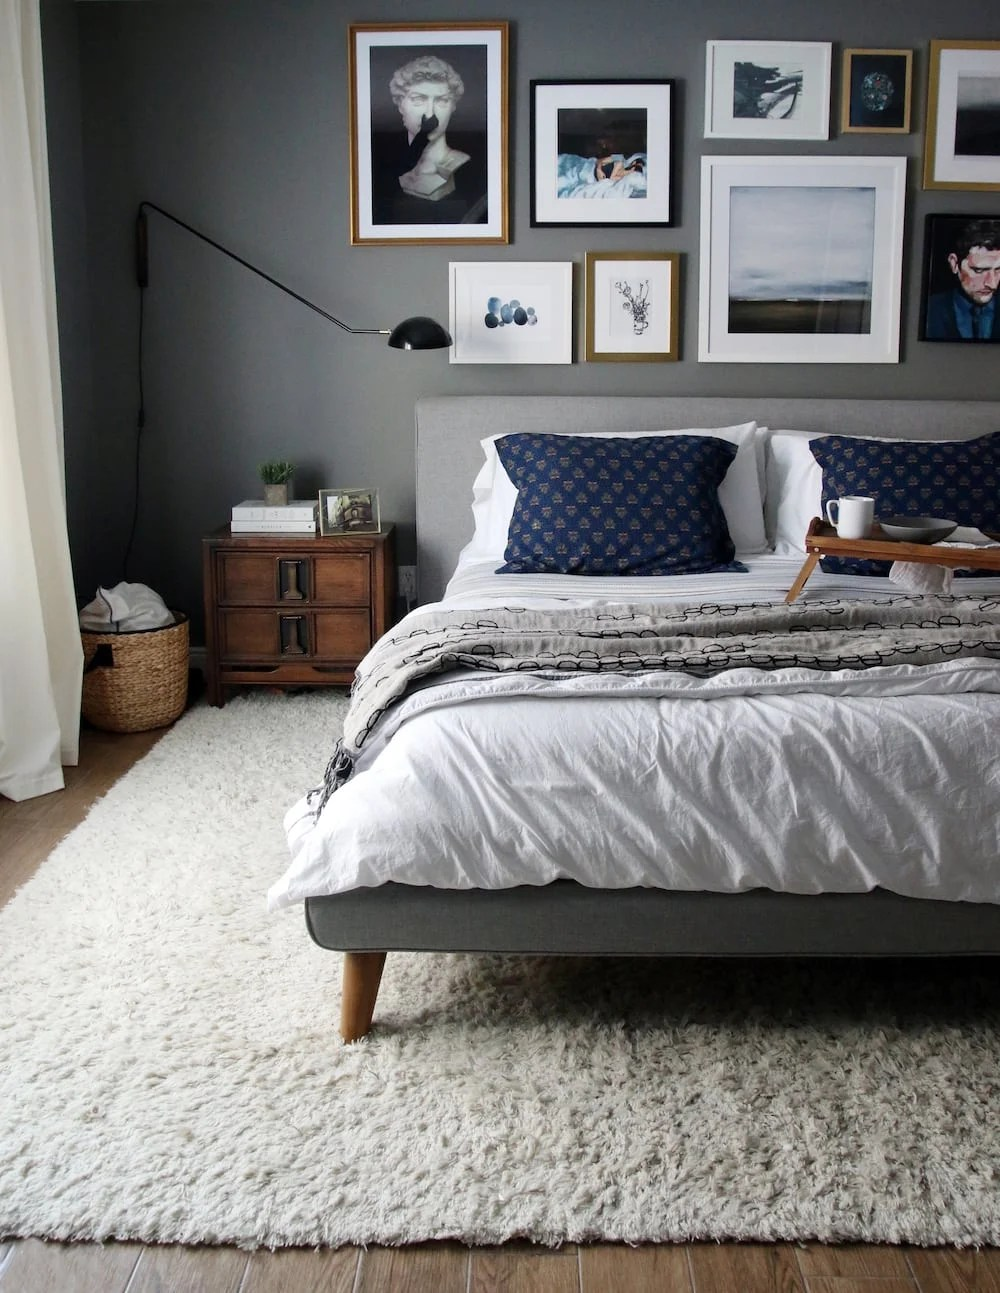 BM Chelsea Gray bedroom adds drama to a dark bedroom